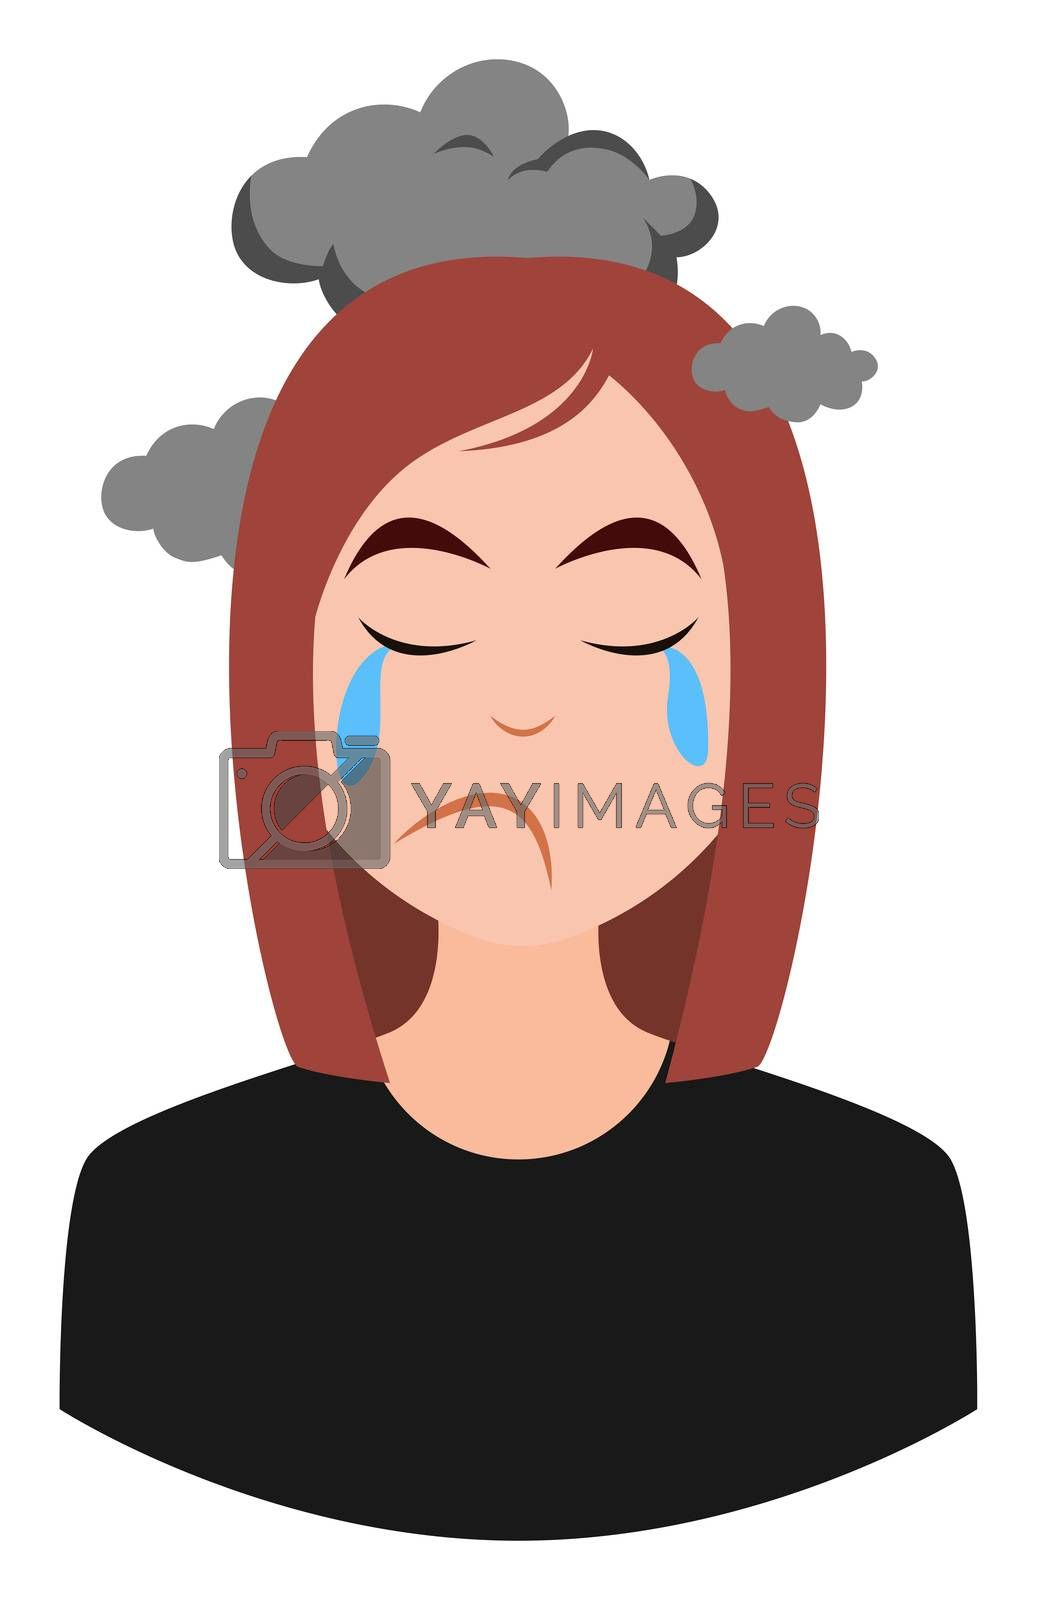 Royalty free image of Depressed girl, illustration, vector on white background by Morphart